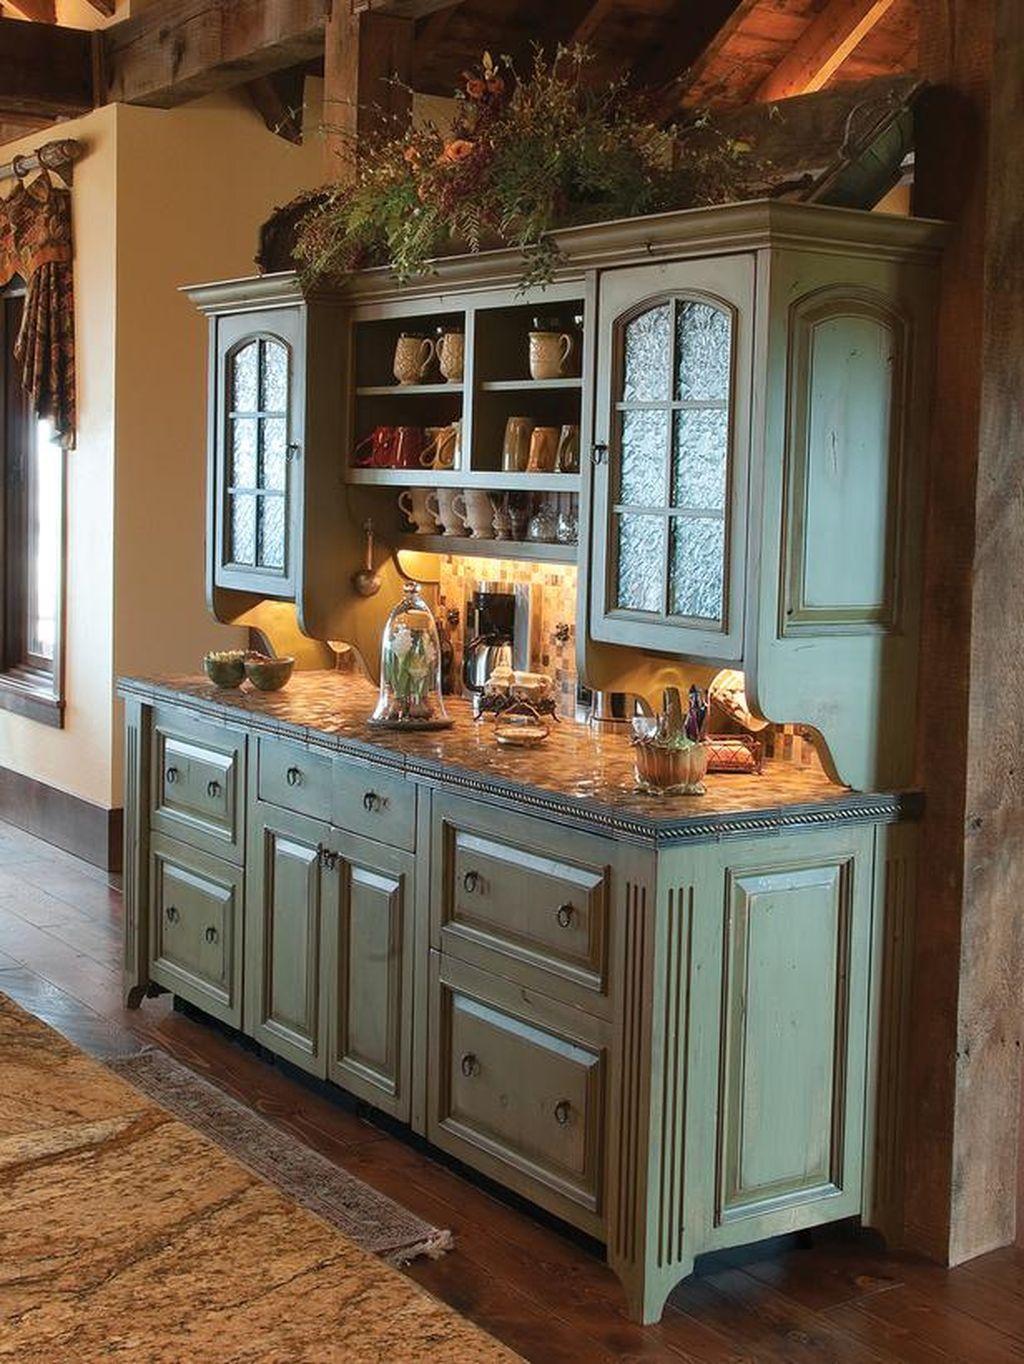 90 Beautiful Farmhouse Style Rustic Kitchen Cabinet Decoration Ideas Aladdinslamp Net Home Design Rustic Kitchen Cabinets Rustic Kitchen Kitchen Cabinets Decor